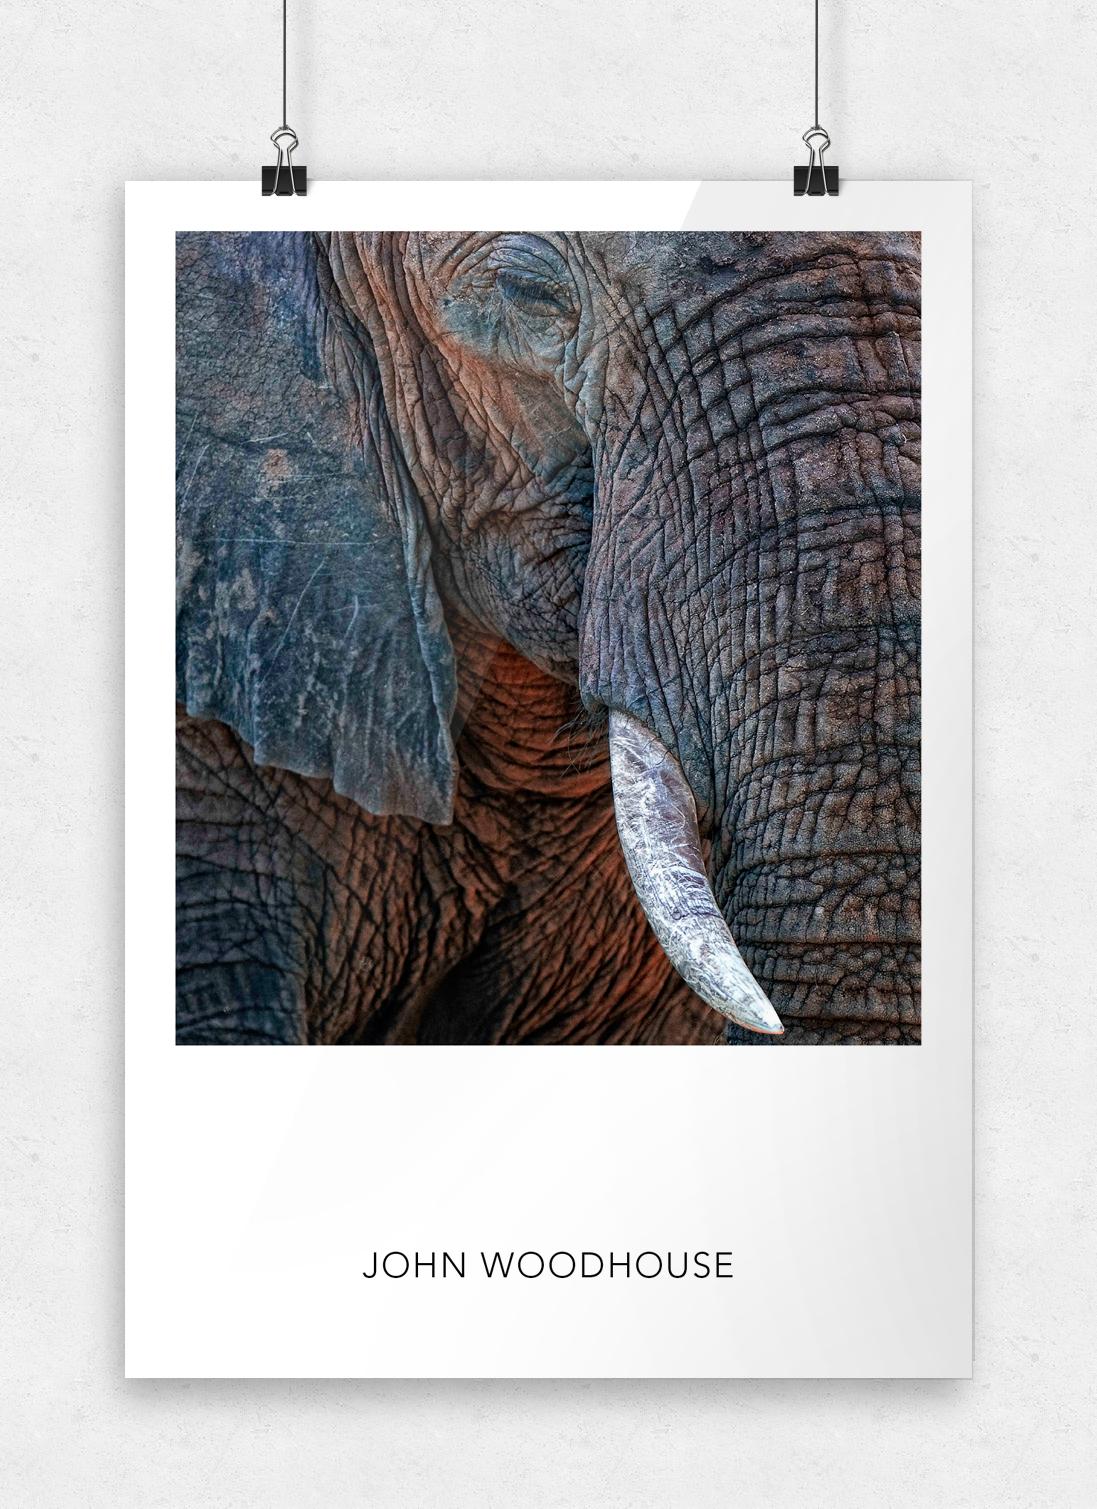 JW-Posters-Template_10.jpg